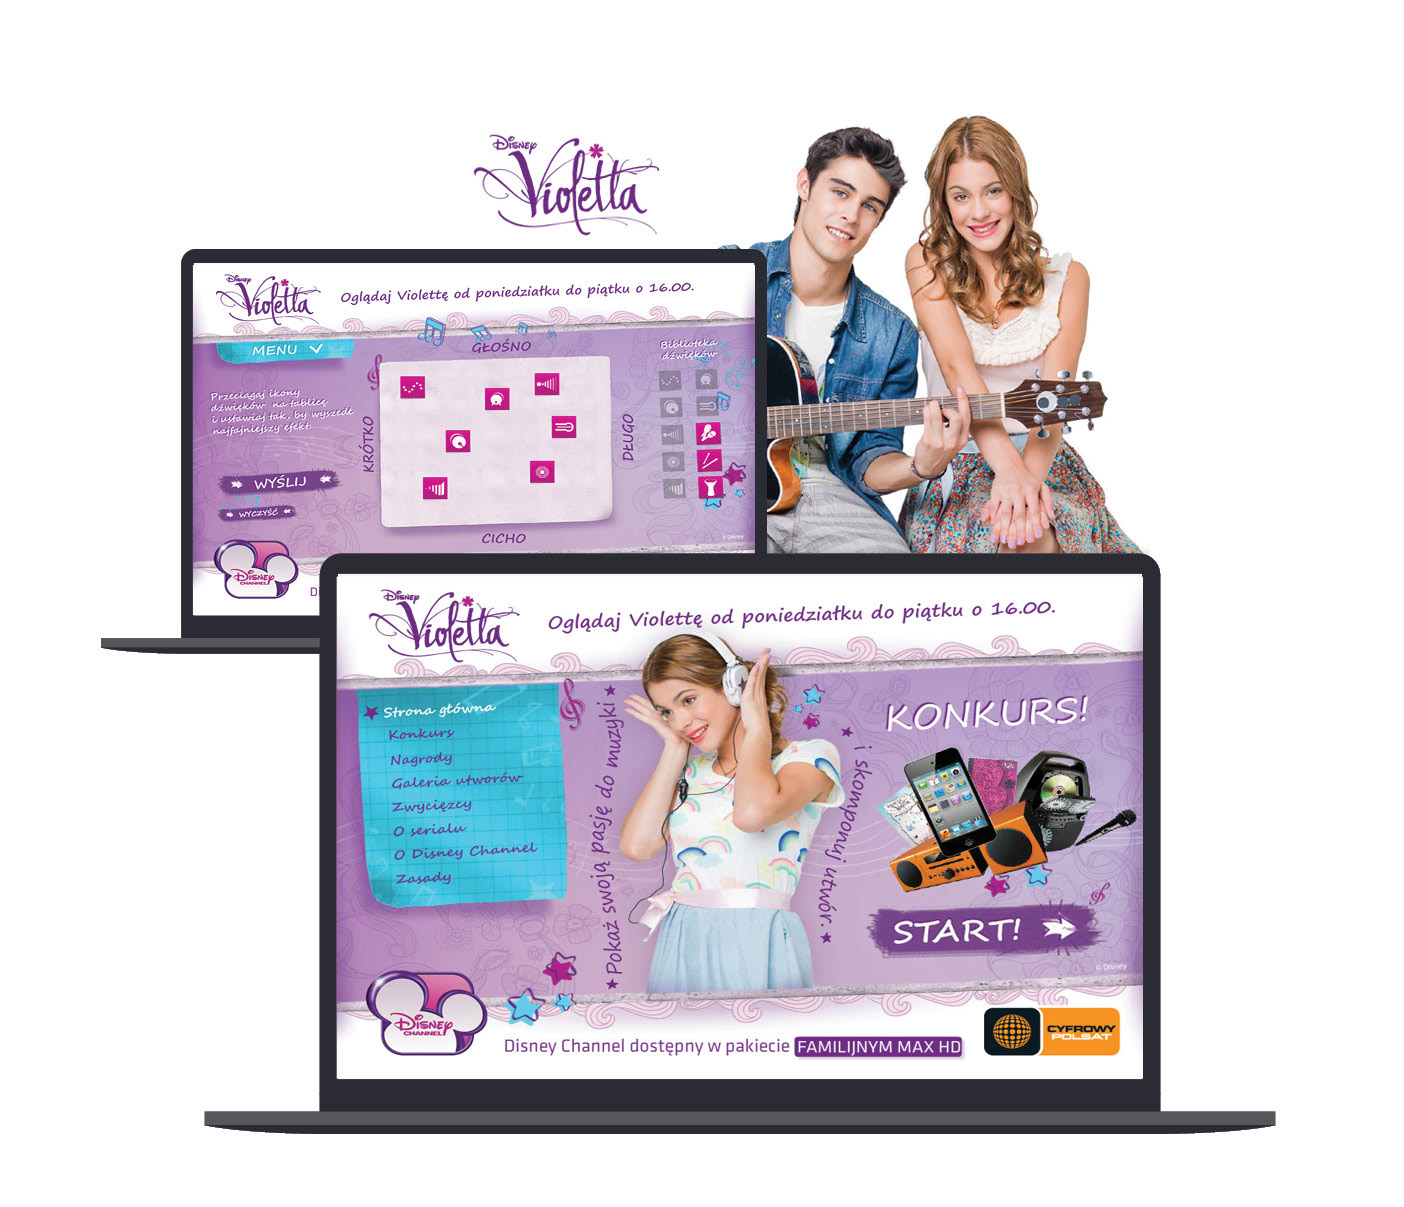 The Walt Disney Company konkurs Violetta Cyfrowy Polsat